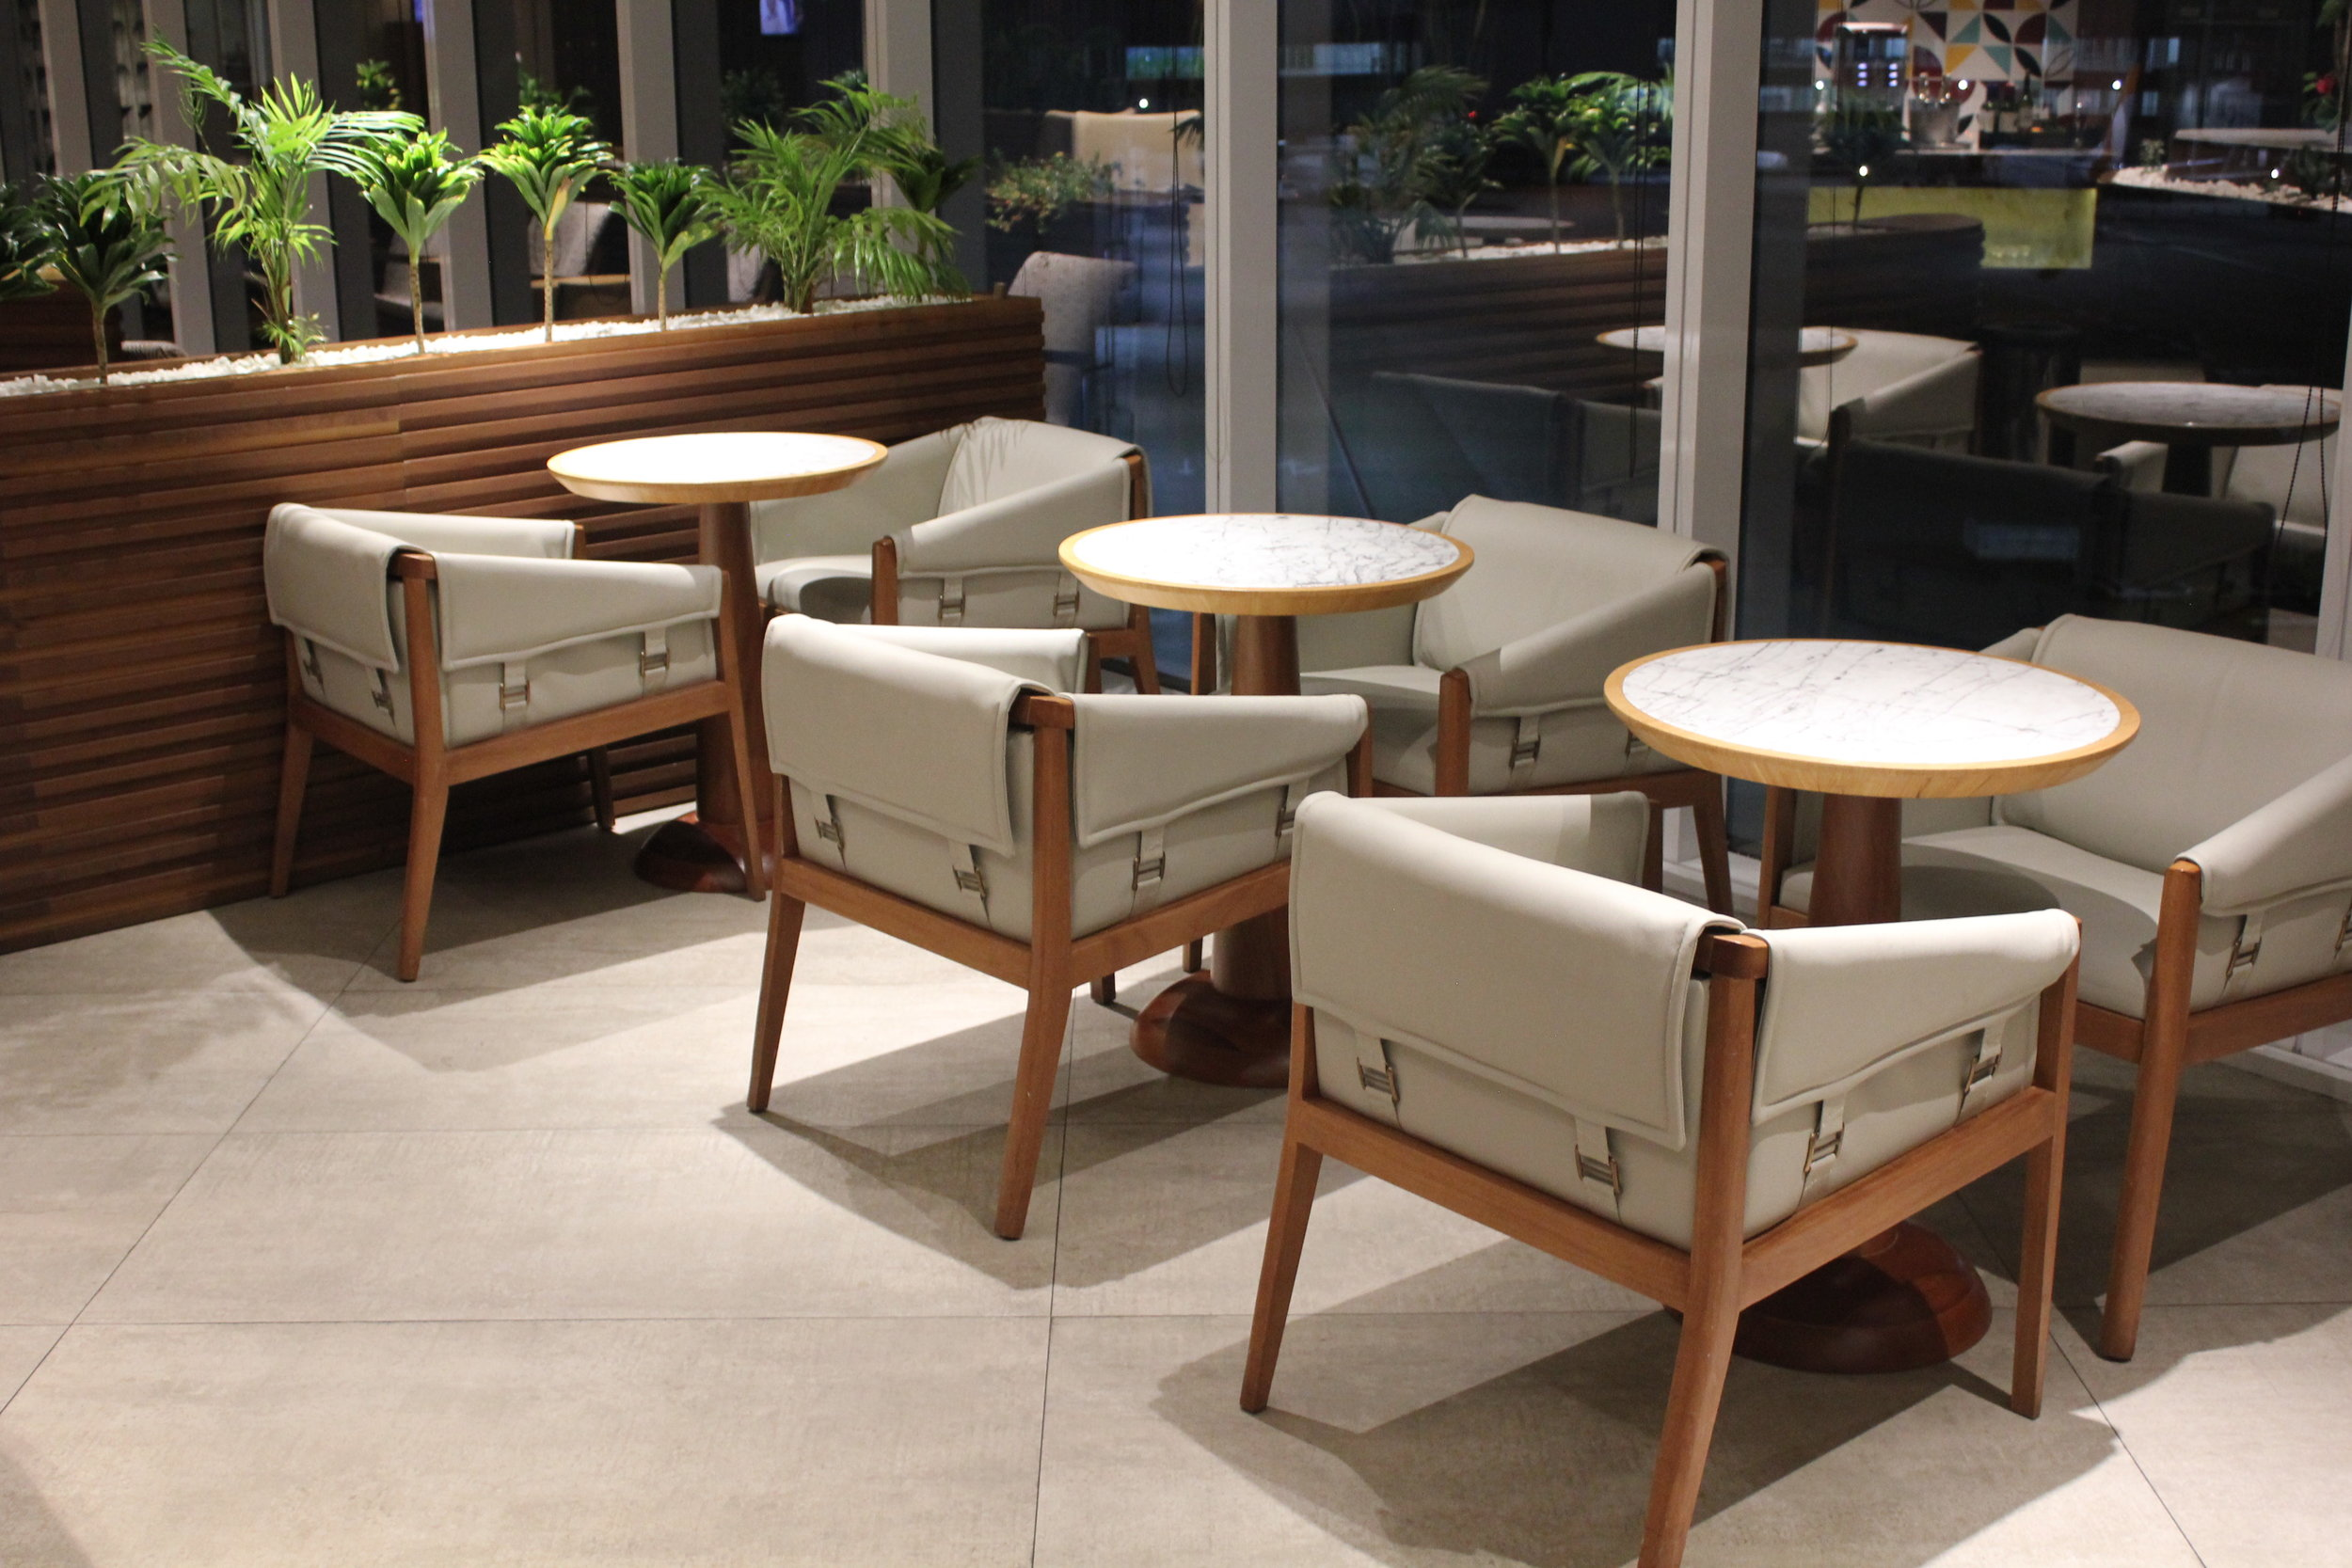 Star Alliance Lounge Rio de Janeiro – Dining tables